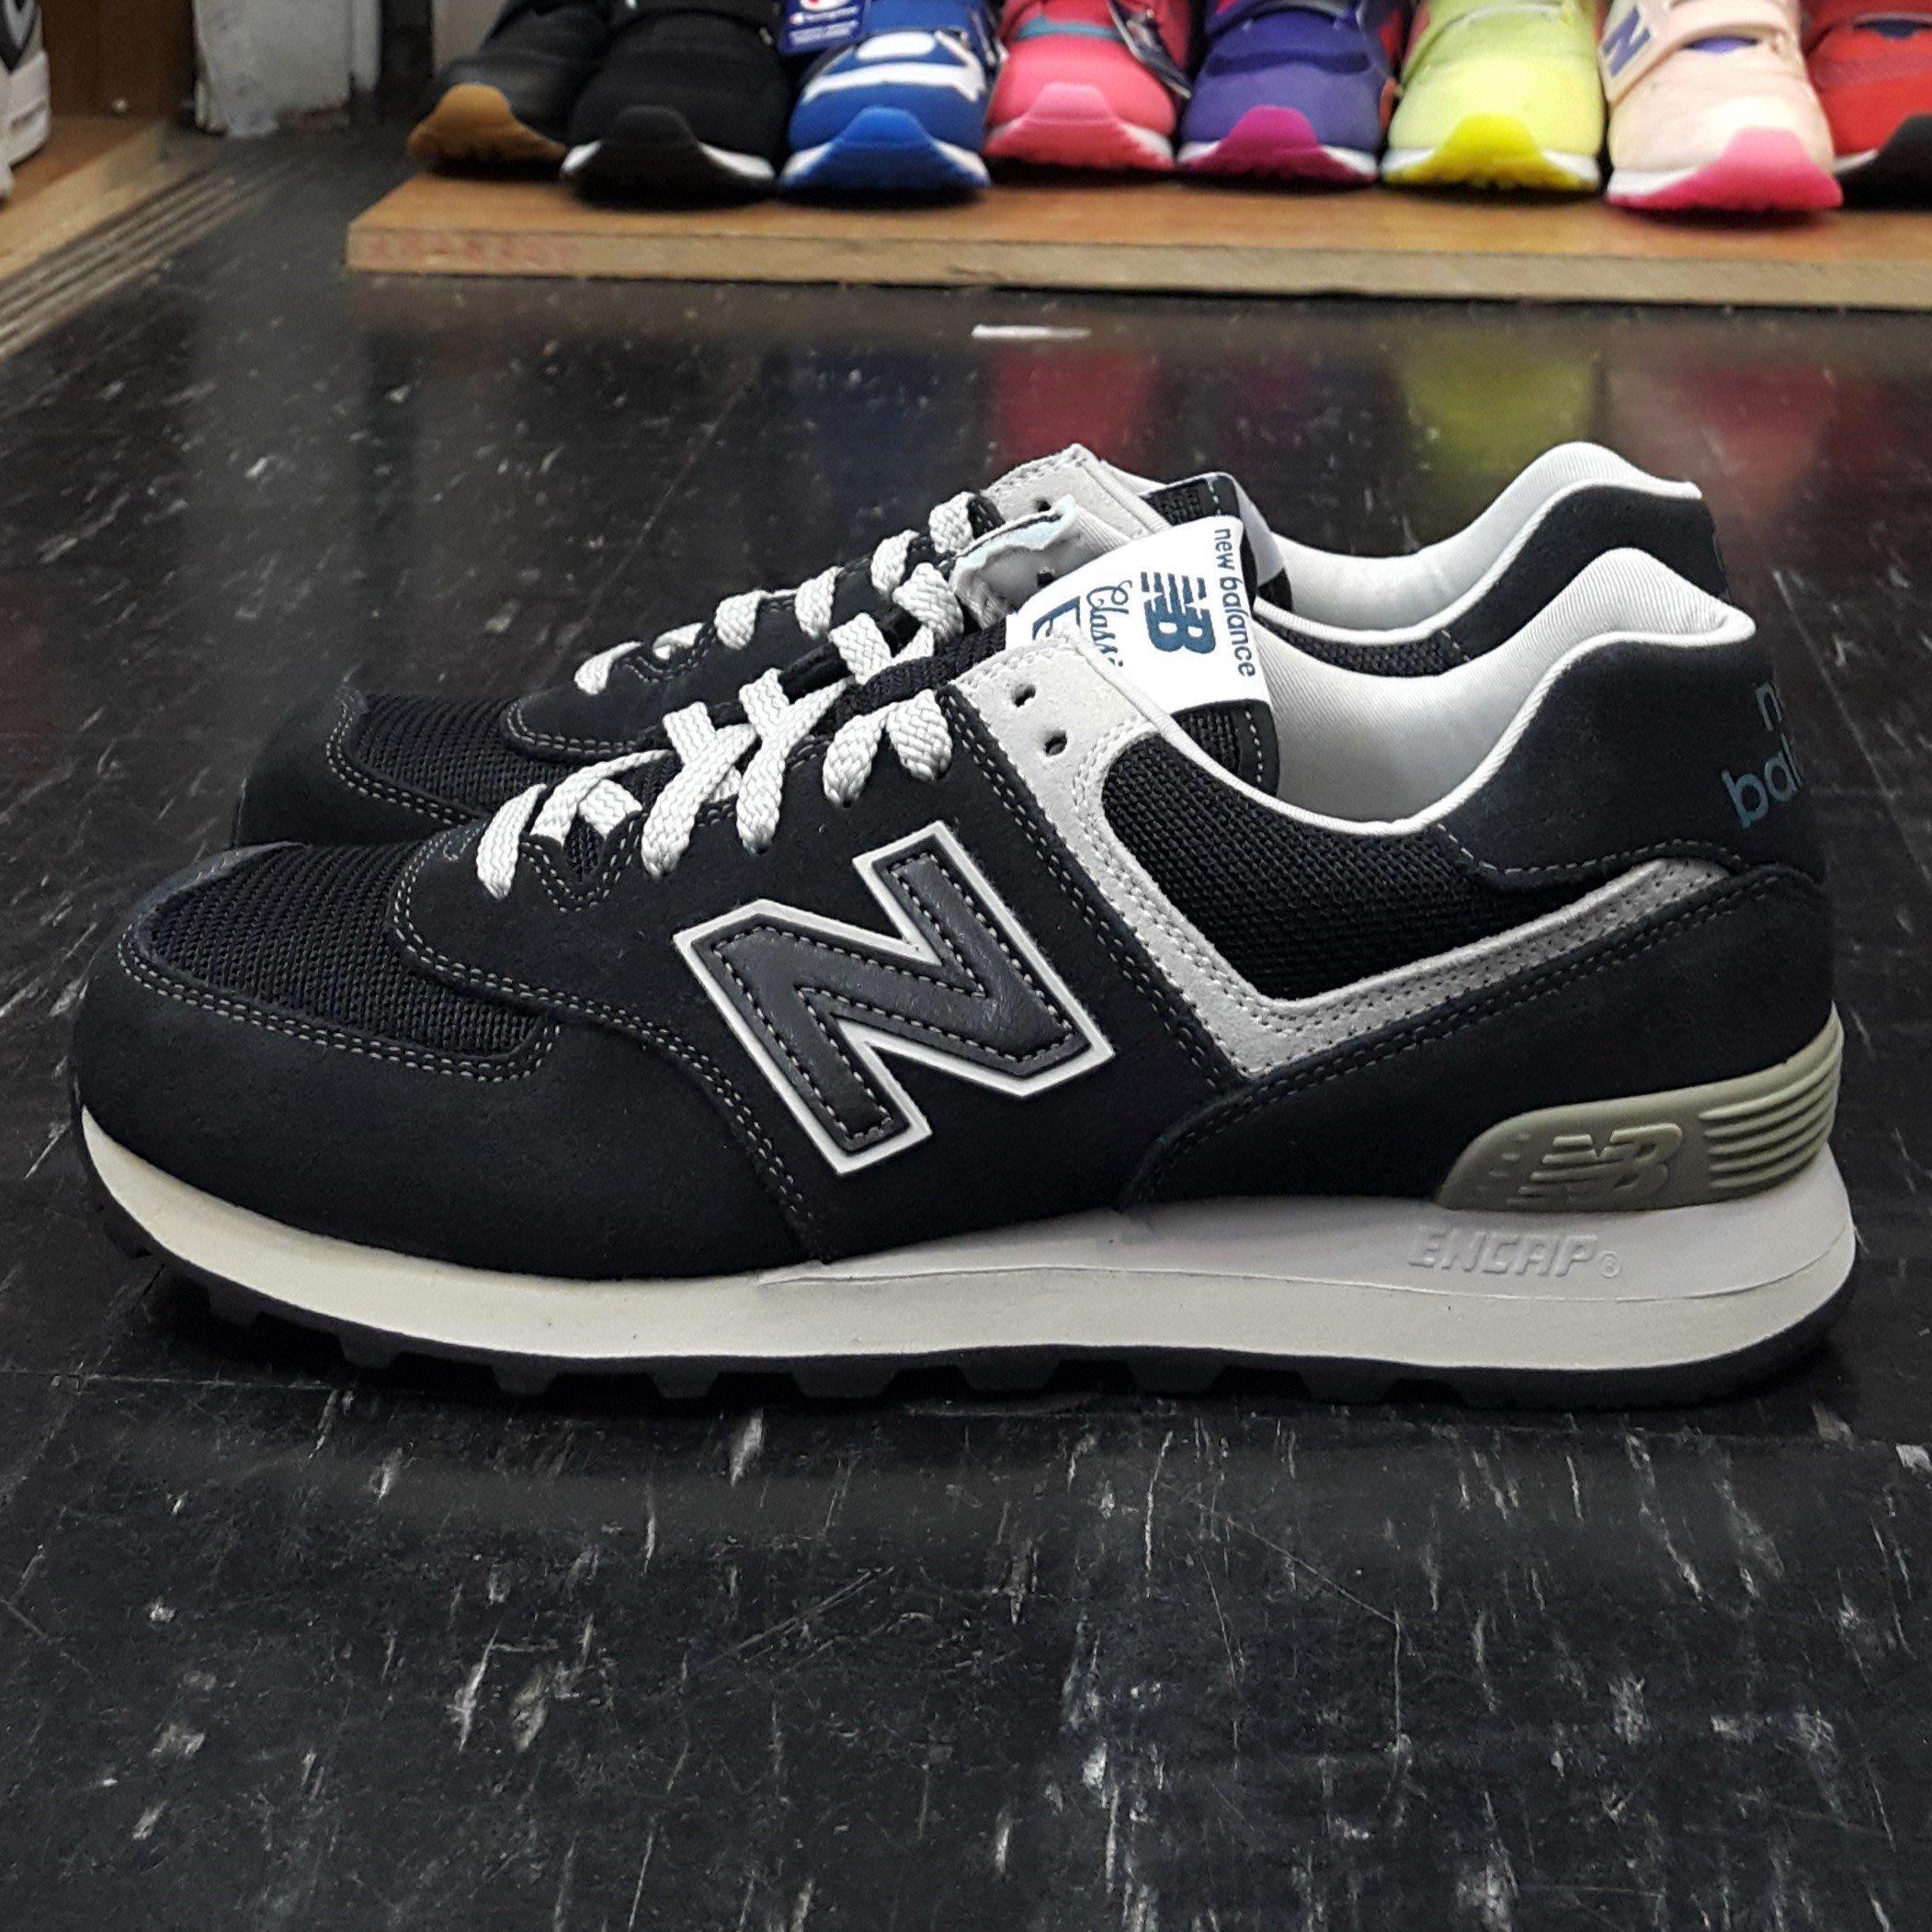 new balance nb 574 ML574FBG 黑色黑白米白色復古麂皮網布慢跑鞋 fc37d14dab3f